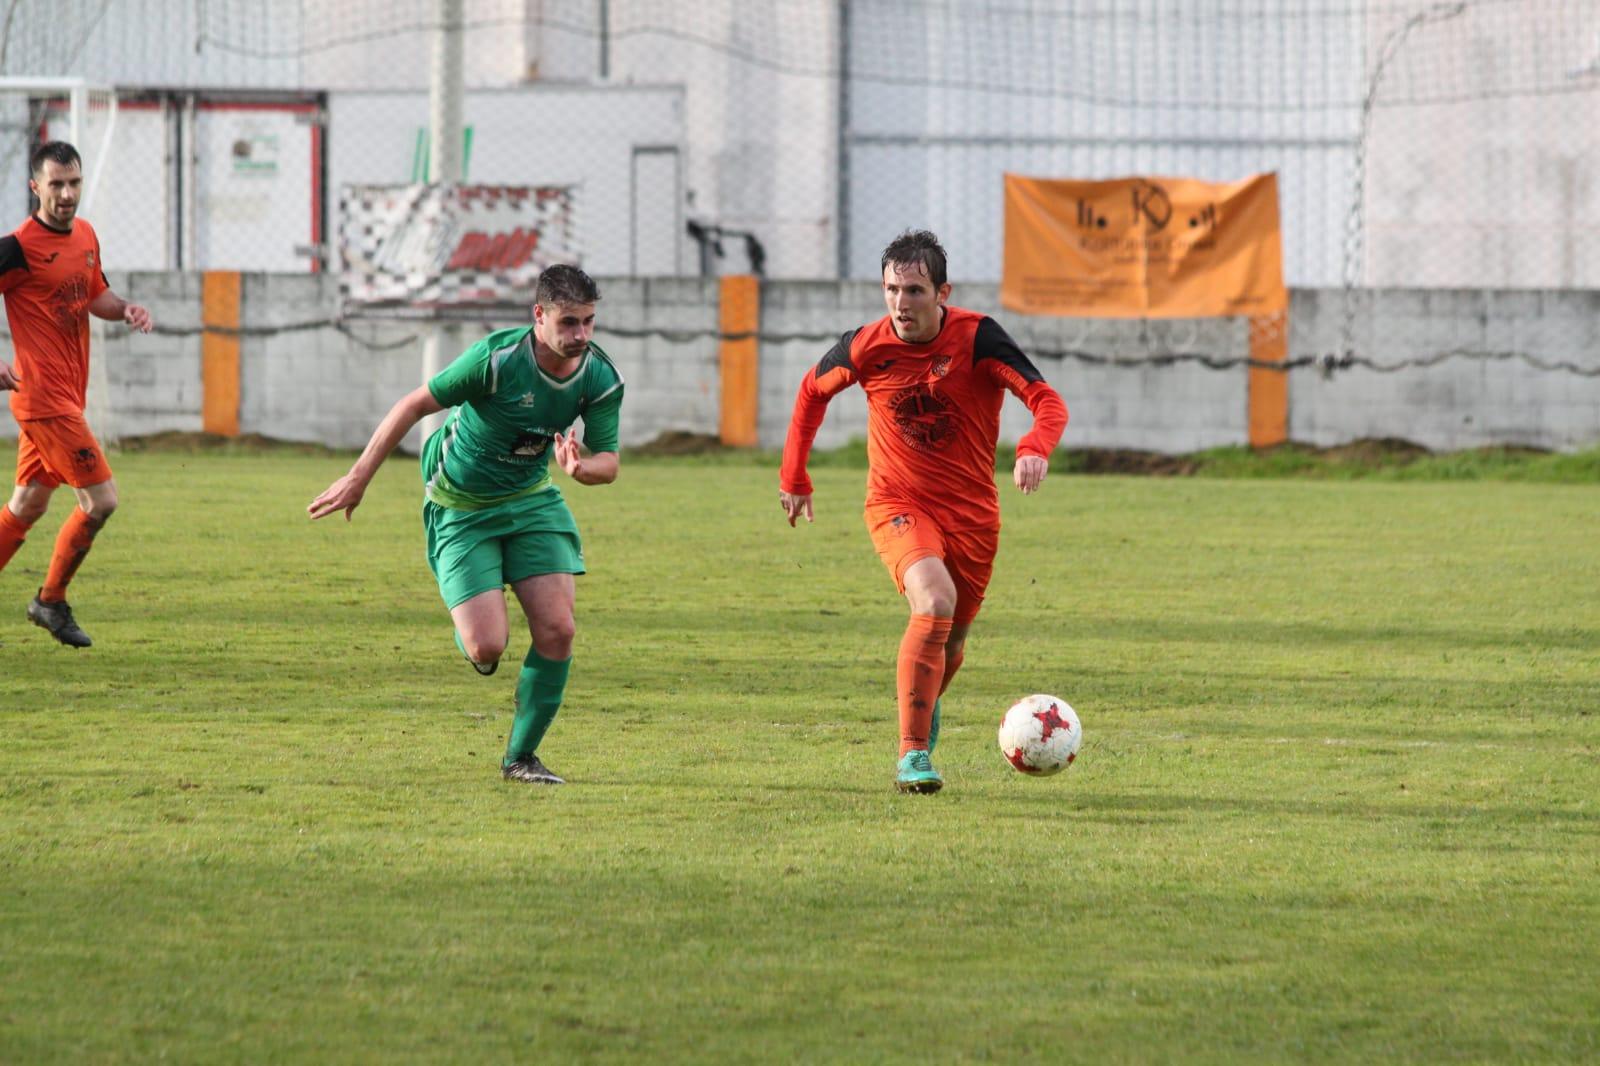 Calendario Tercera Division.U D Samano Calendario 3ª Division 2018 2019